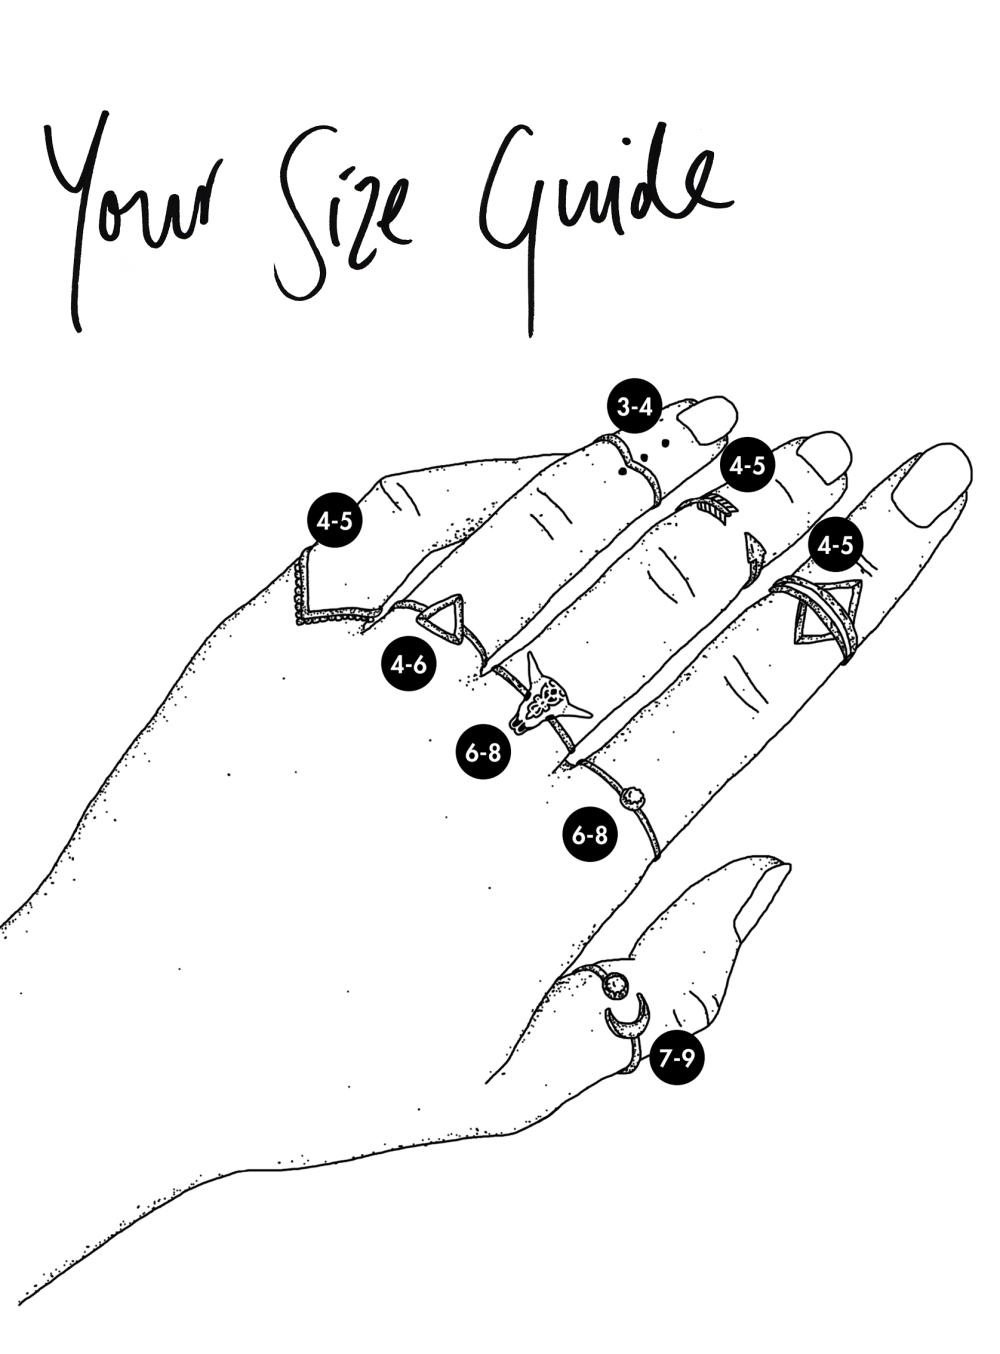 Midsummer Star Hand Diagram - Product Photo